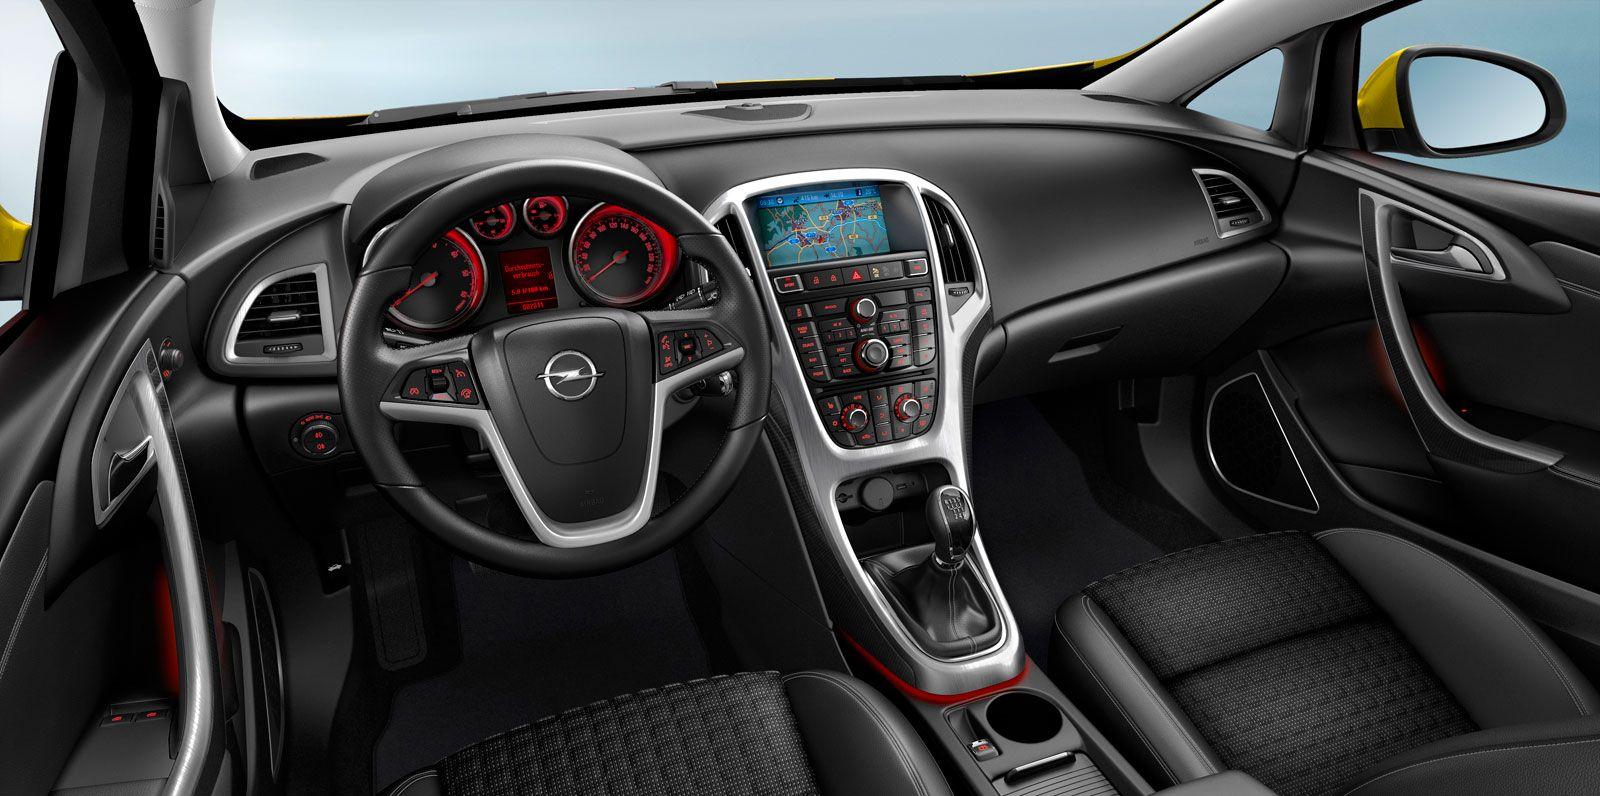 Opel Astra GTC - Interior | Auto | Pinterest